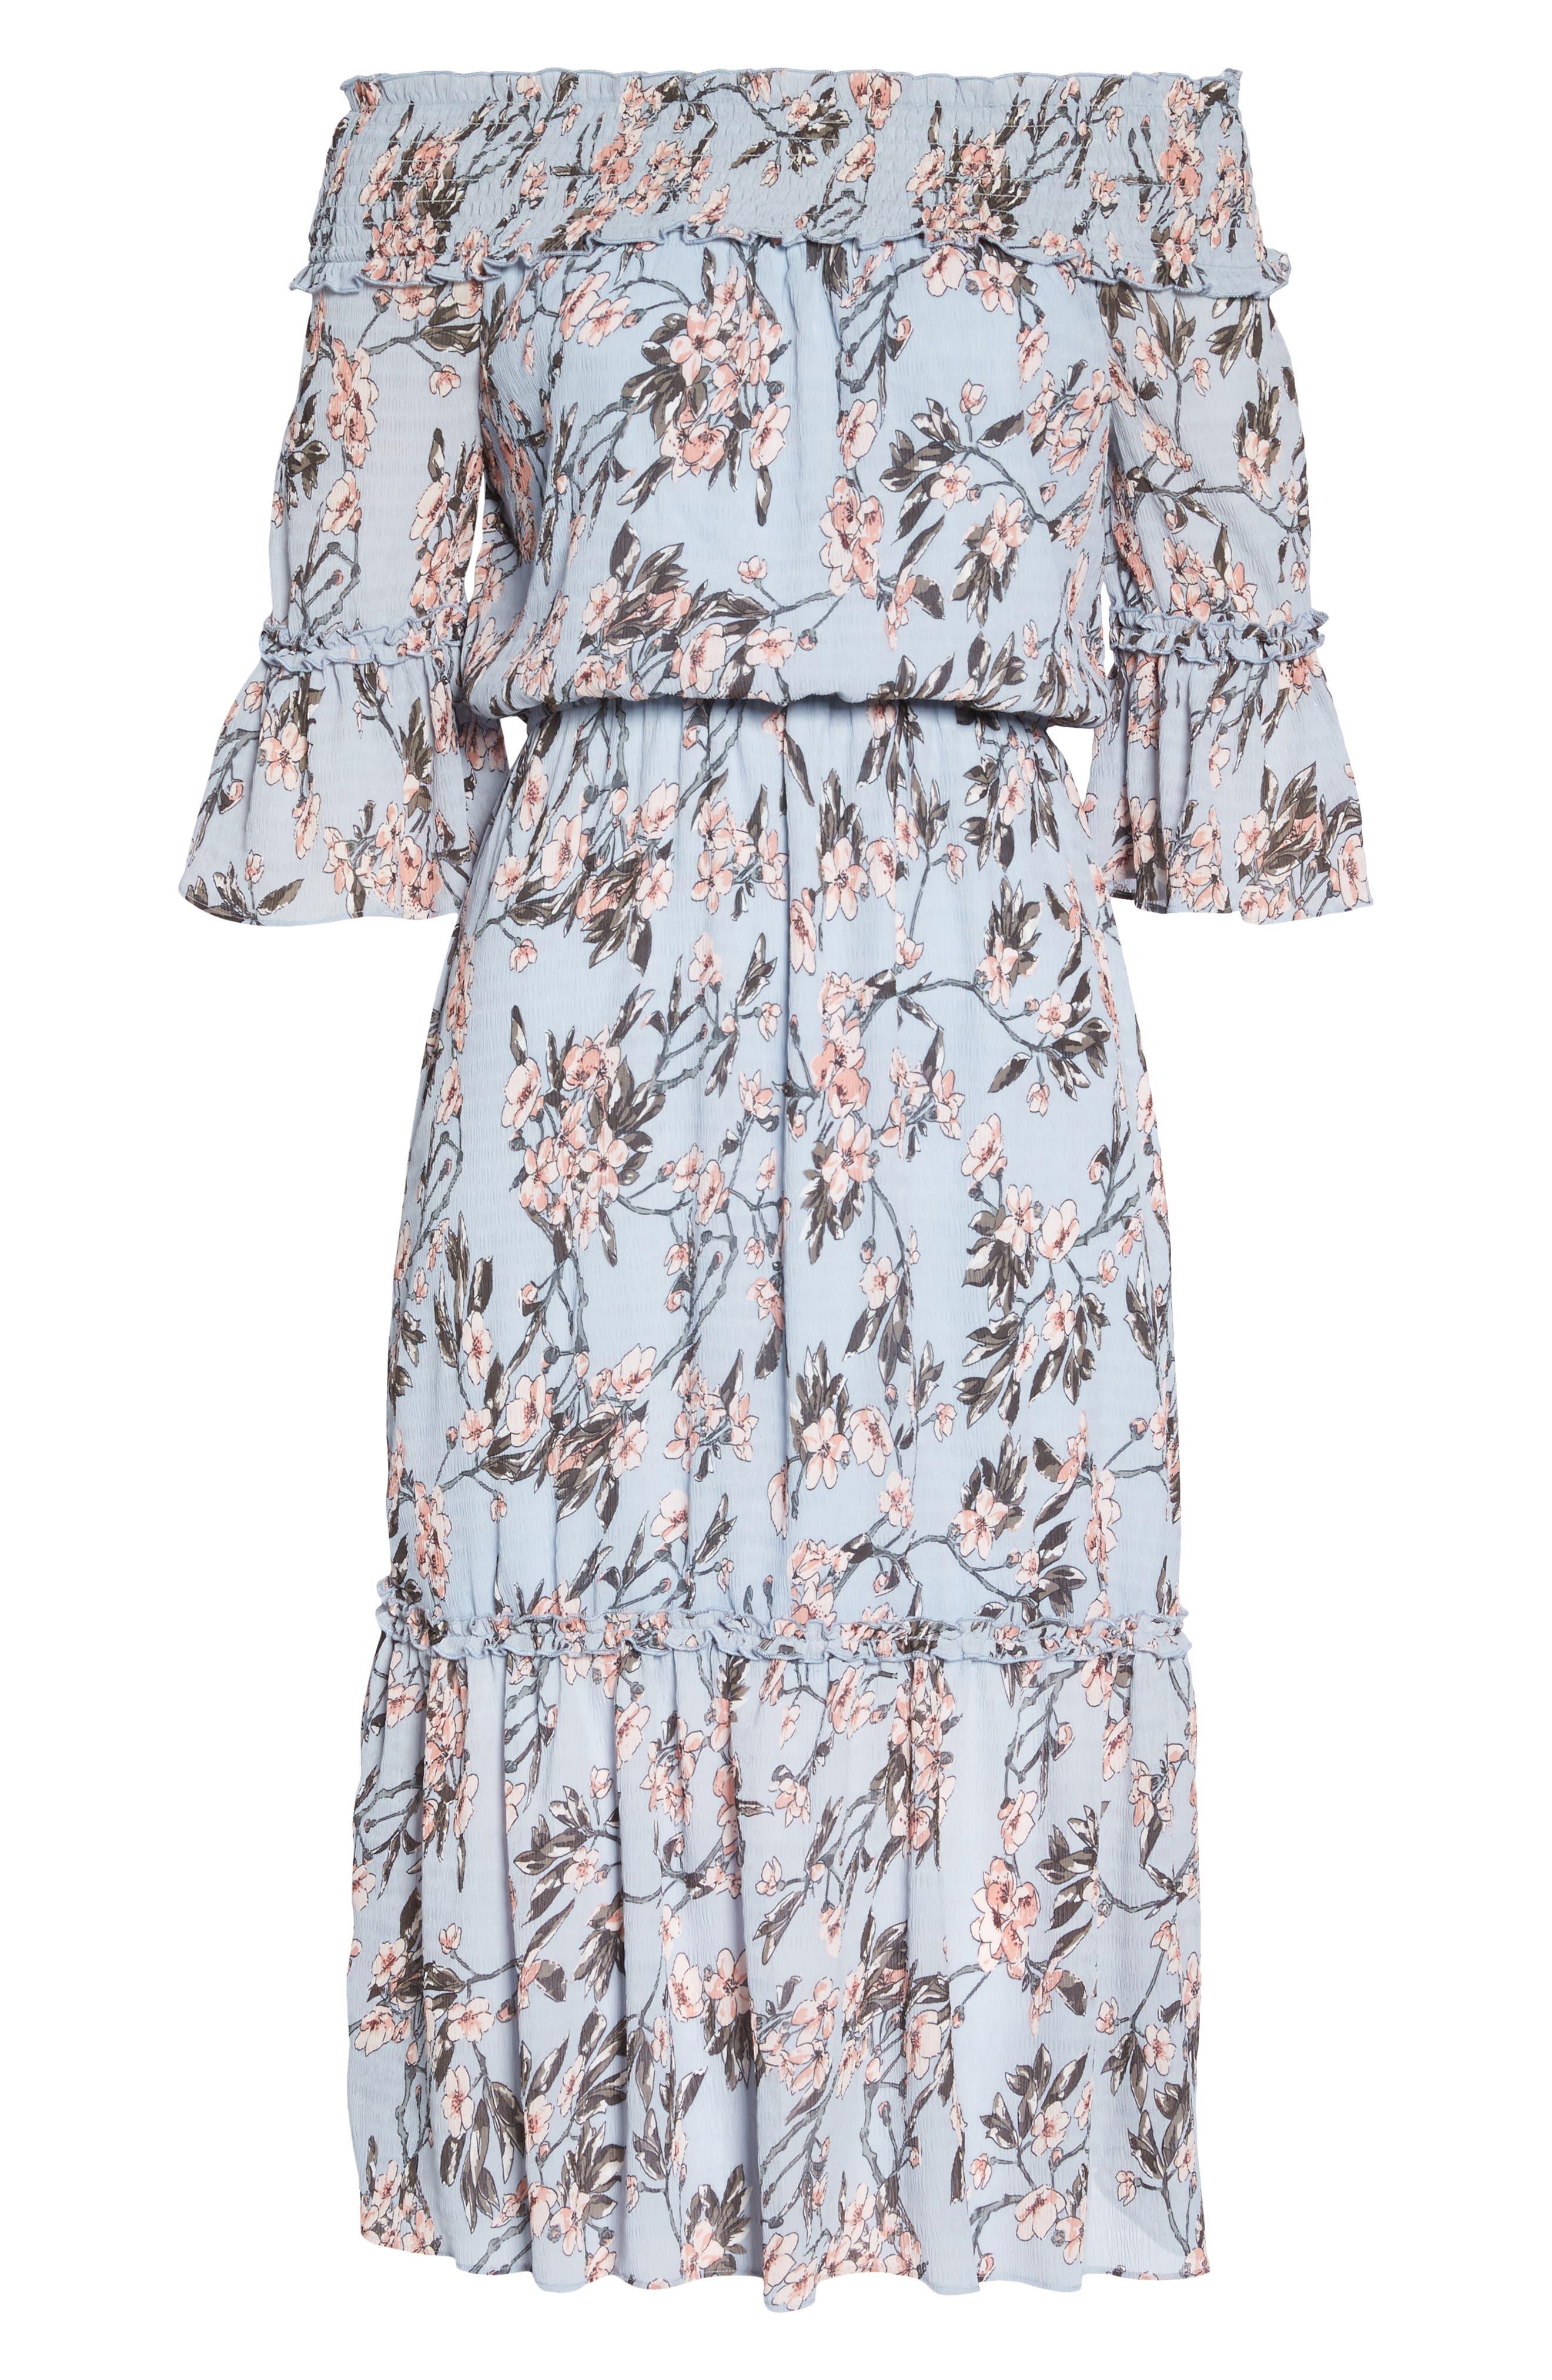 Off the Shoulder Midi Dress,                             Alternate thumbnail 7, color,                             Light Blue Sakura Floral